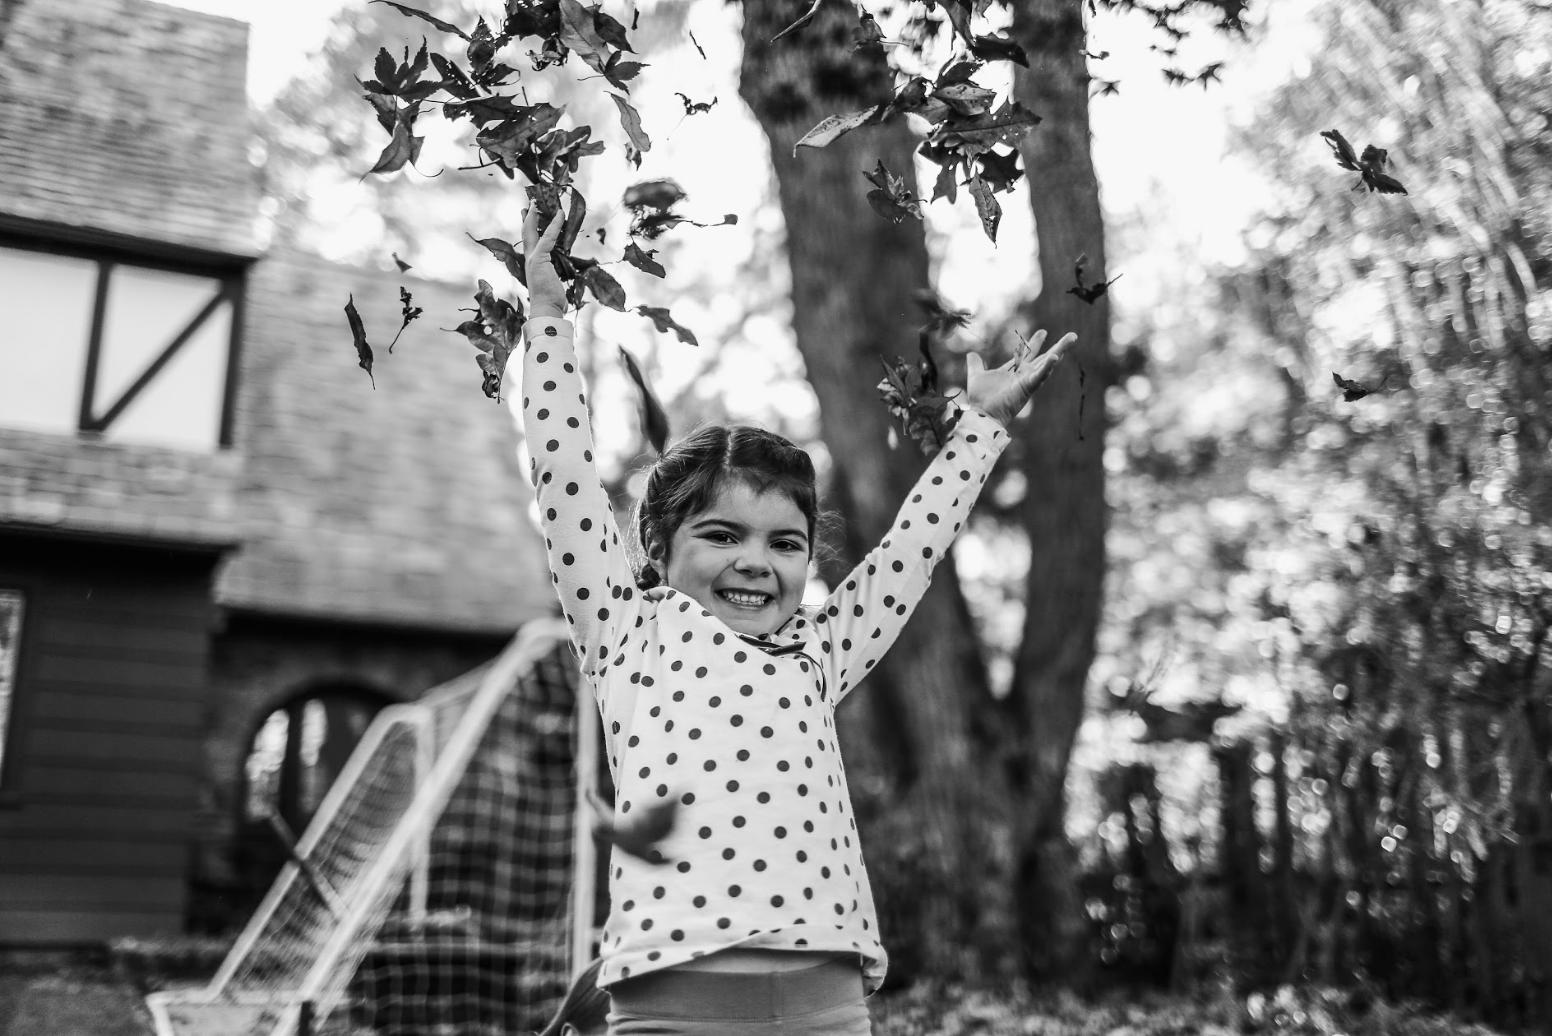 Photo of Lea by Christa Doran